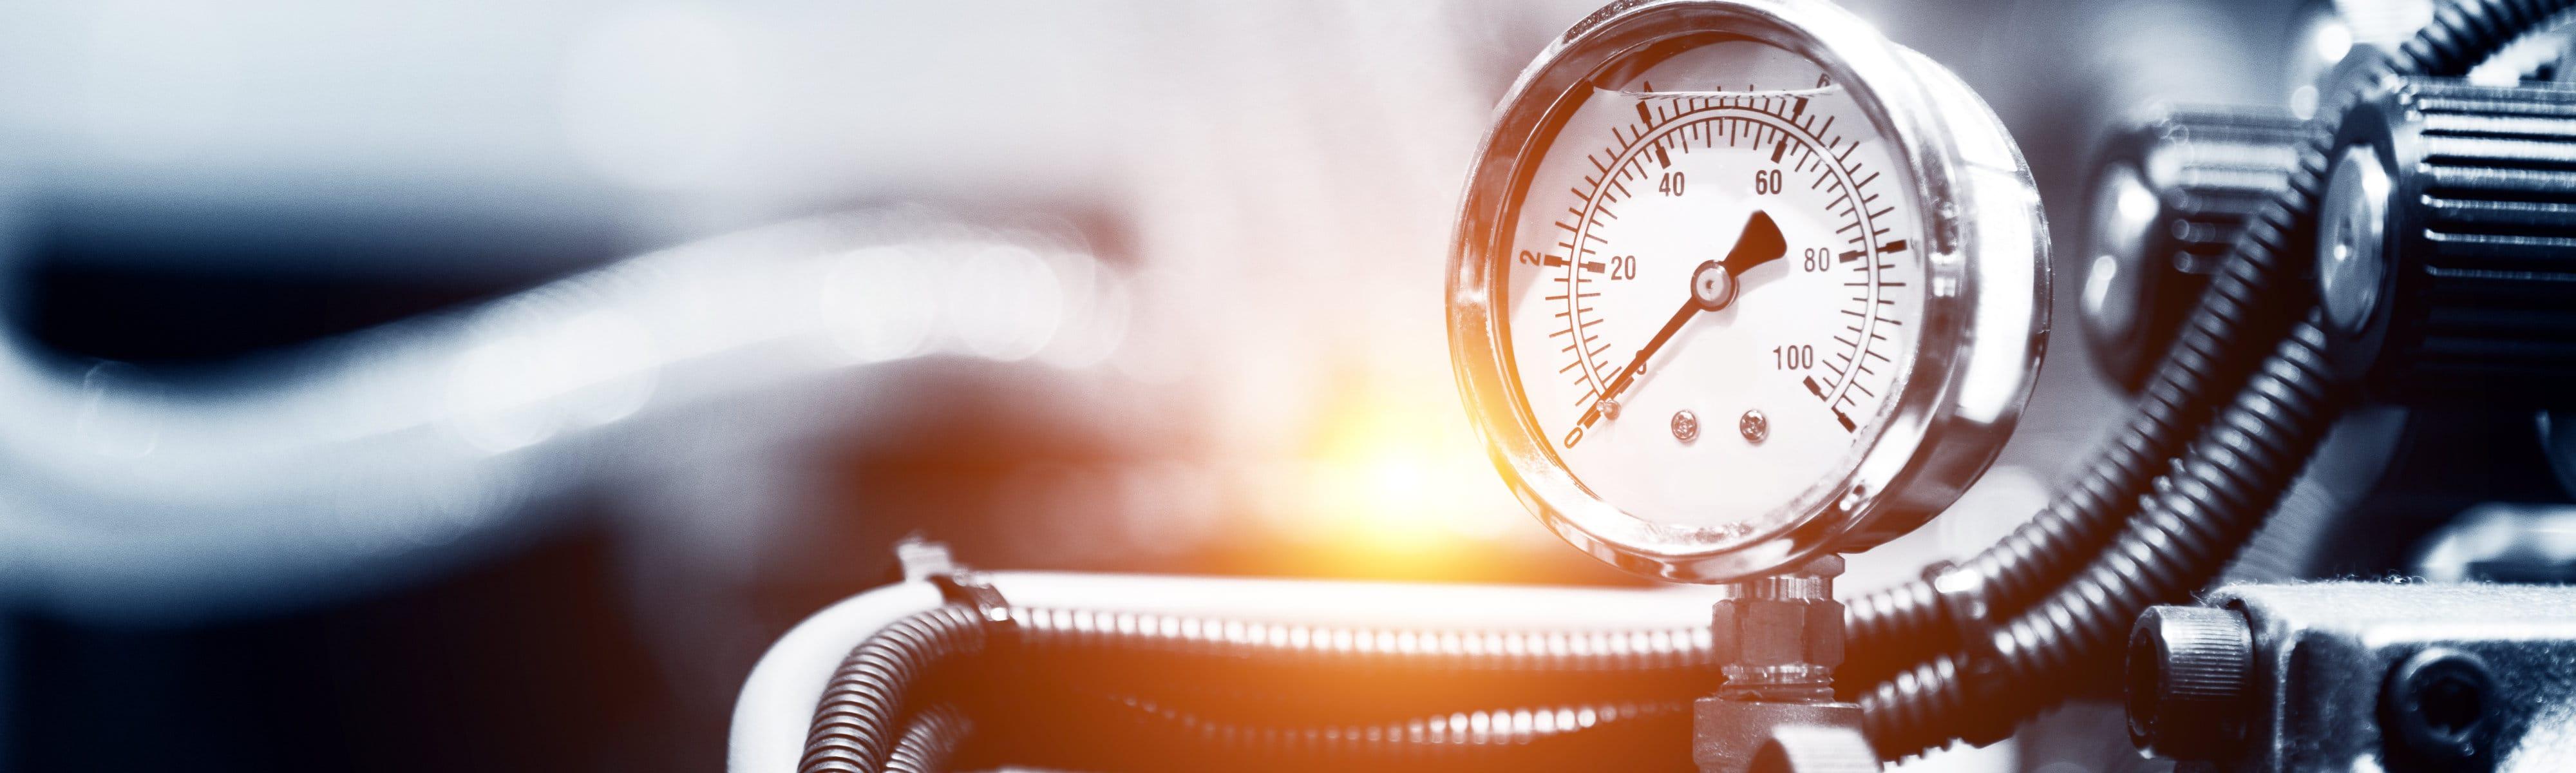 maintenance-pressure-gauge